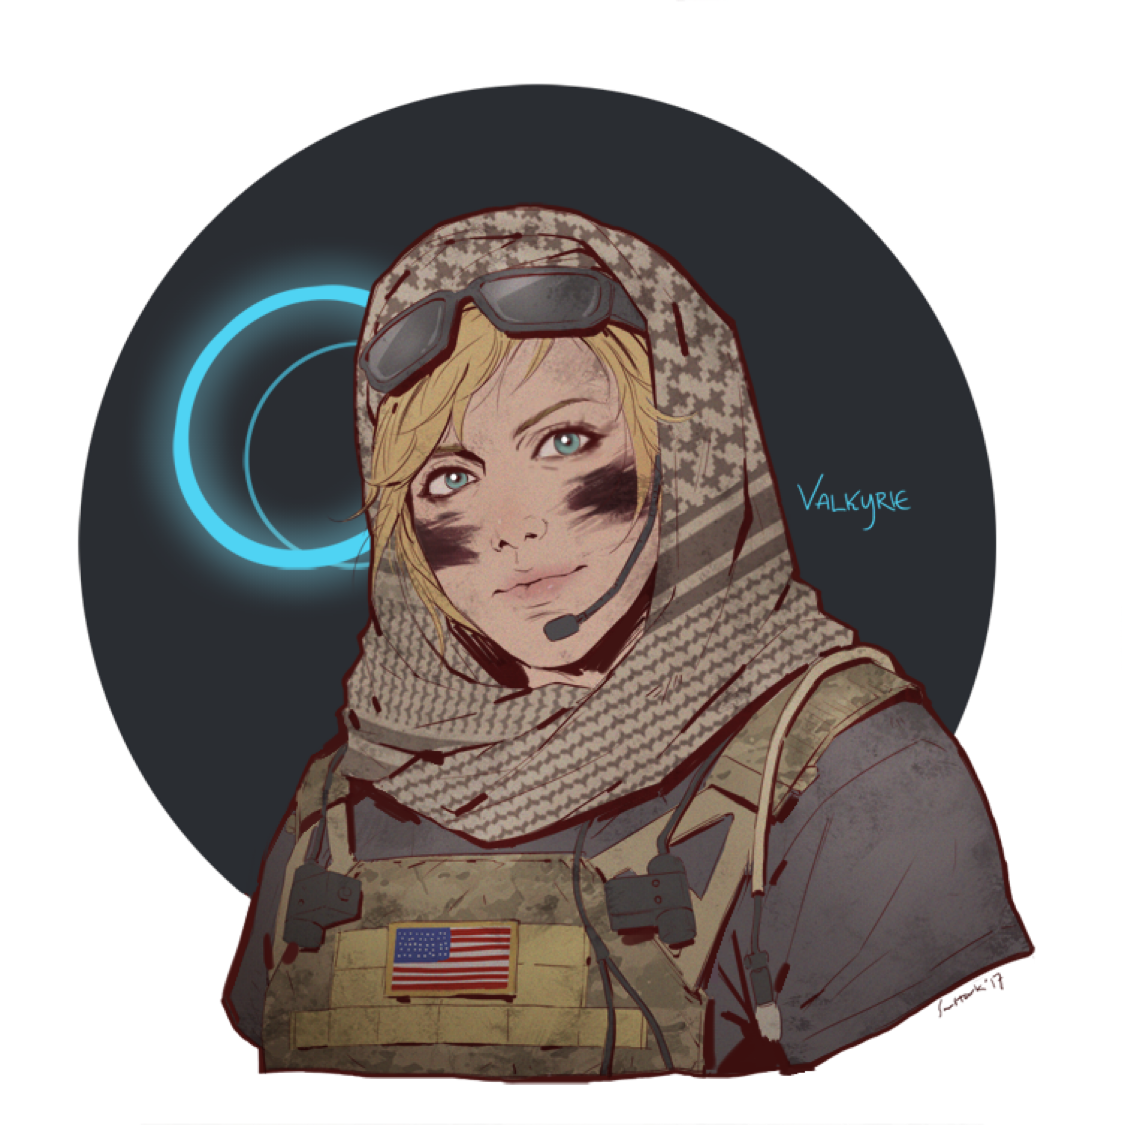 Valkyrie by @cpt_sunstark on Twitter | Rainbow Six Siege